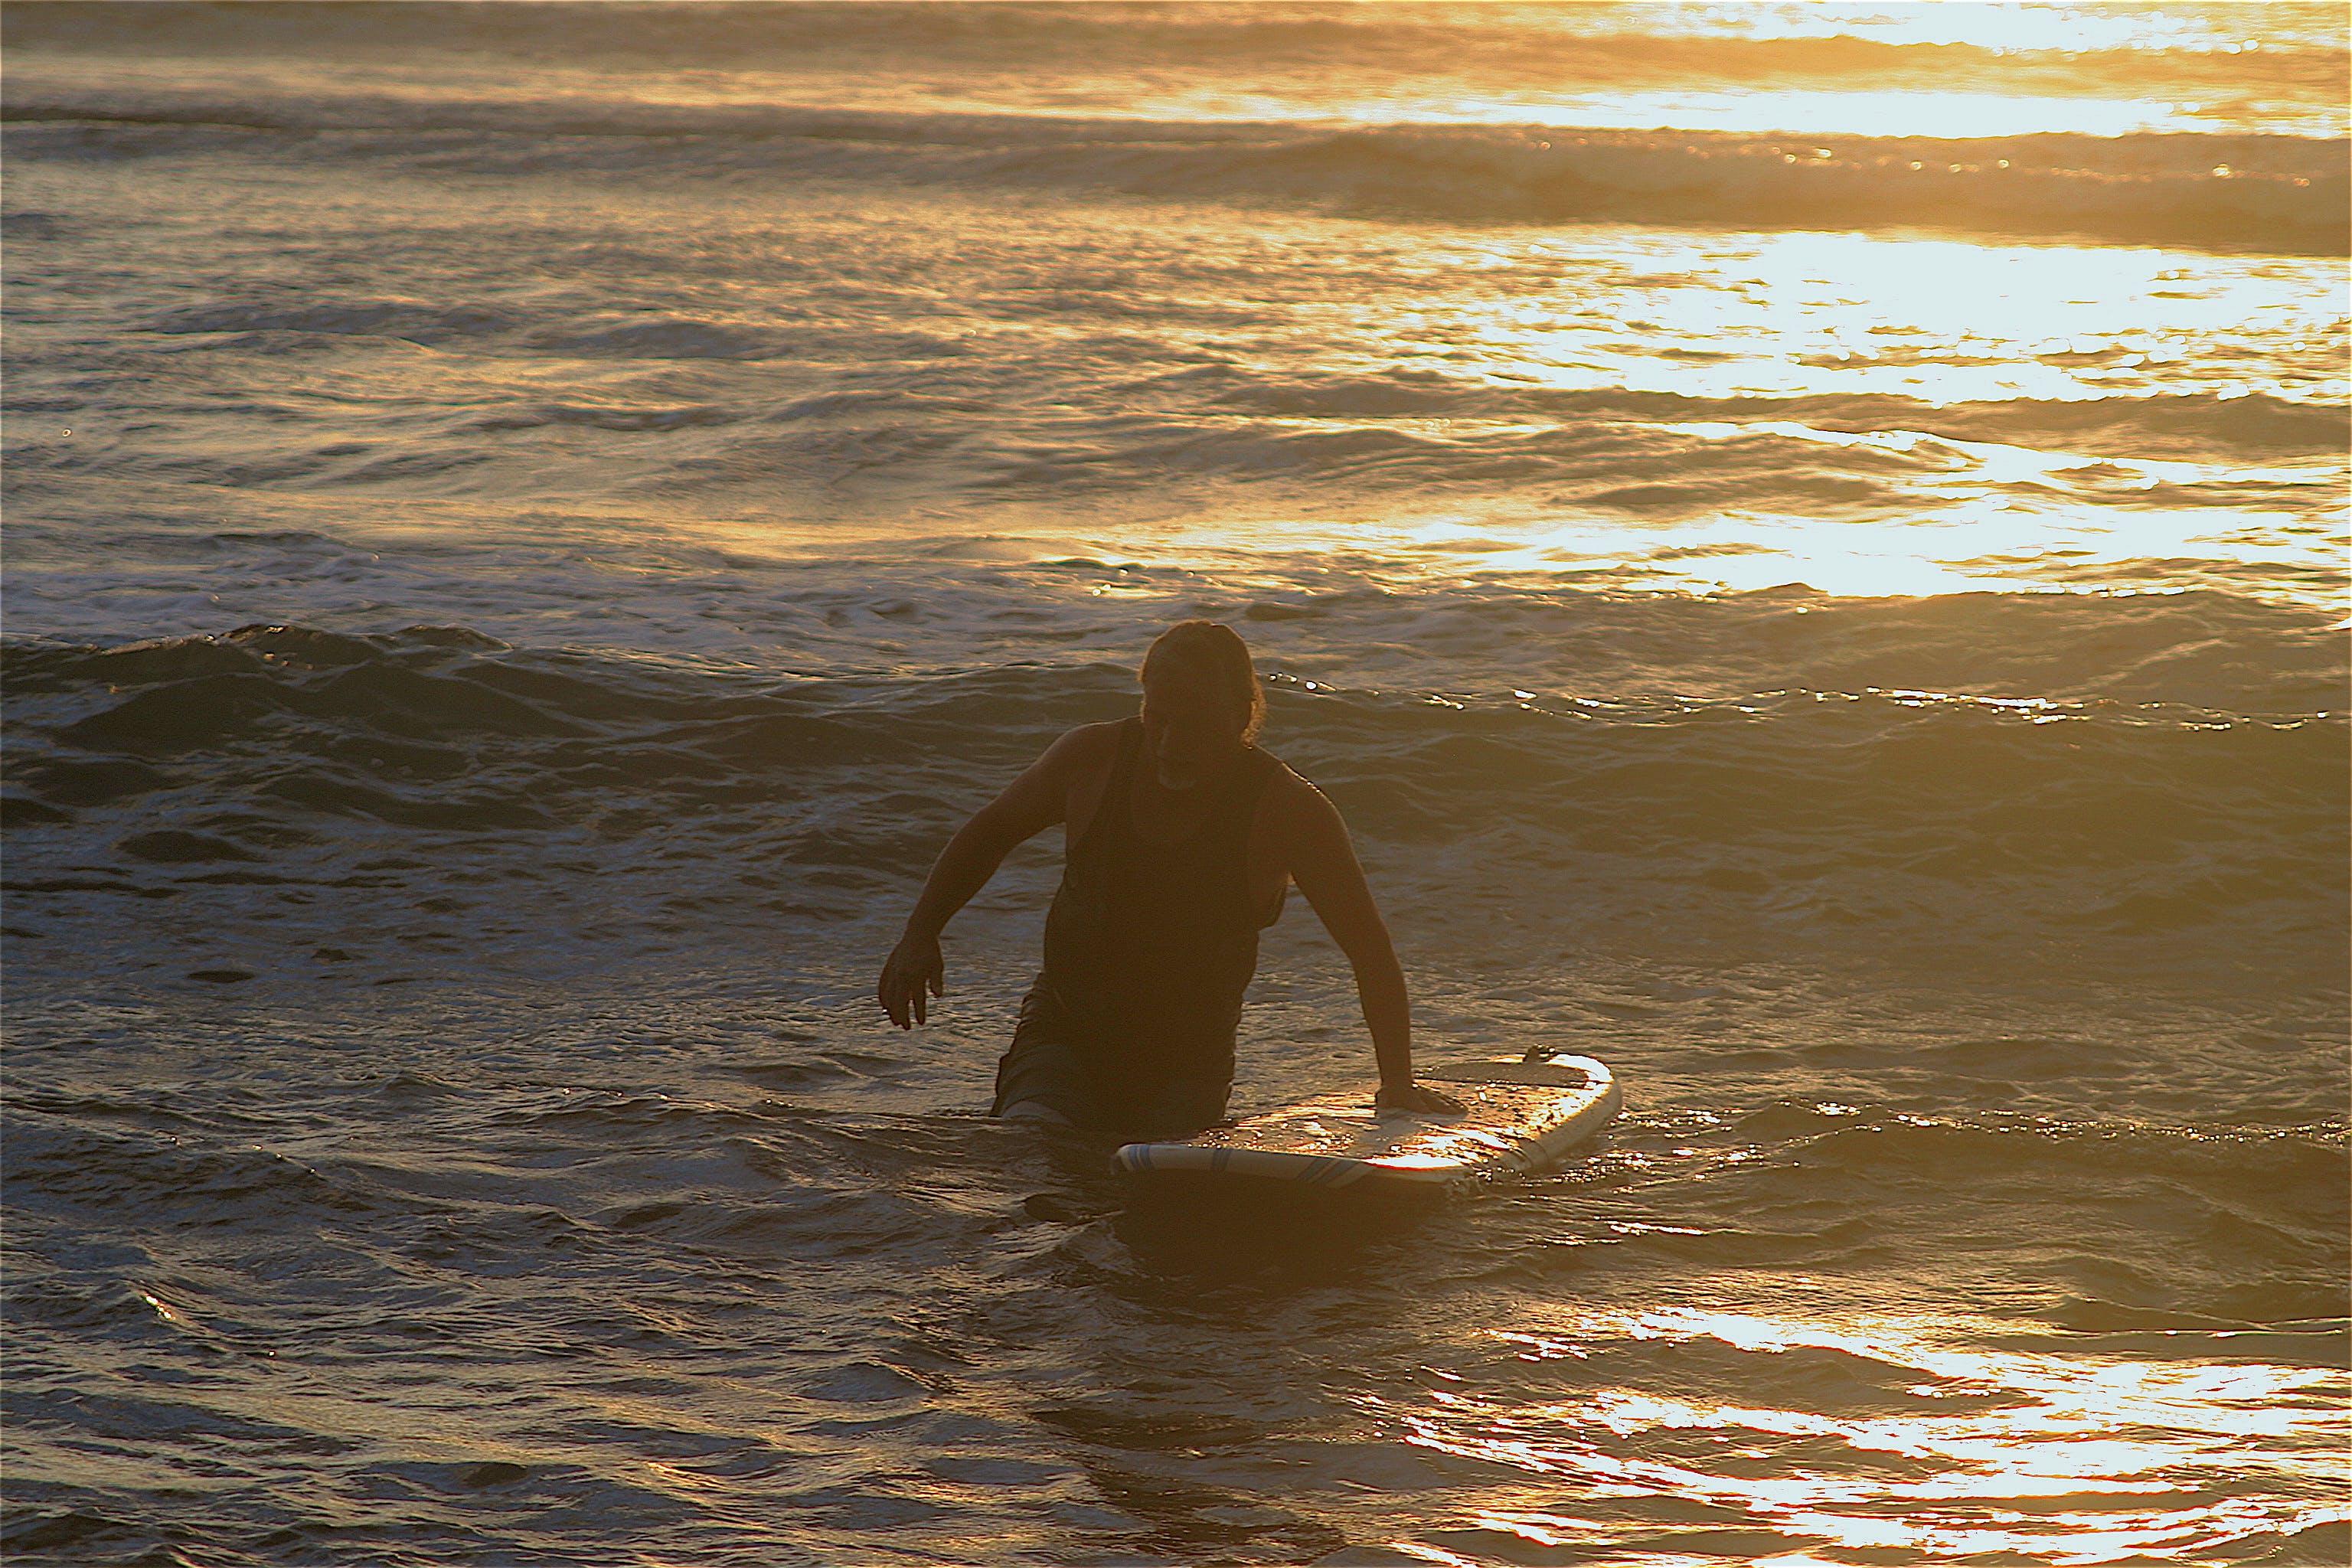 Free stock photo of beach, ocean, surfer